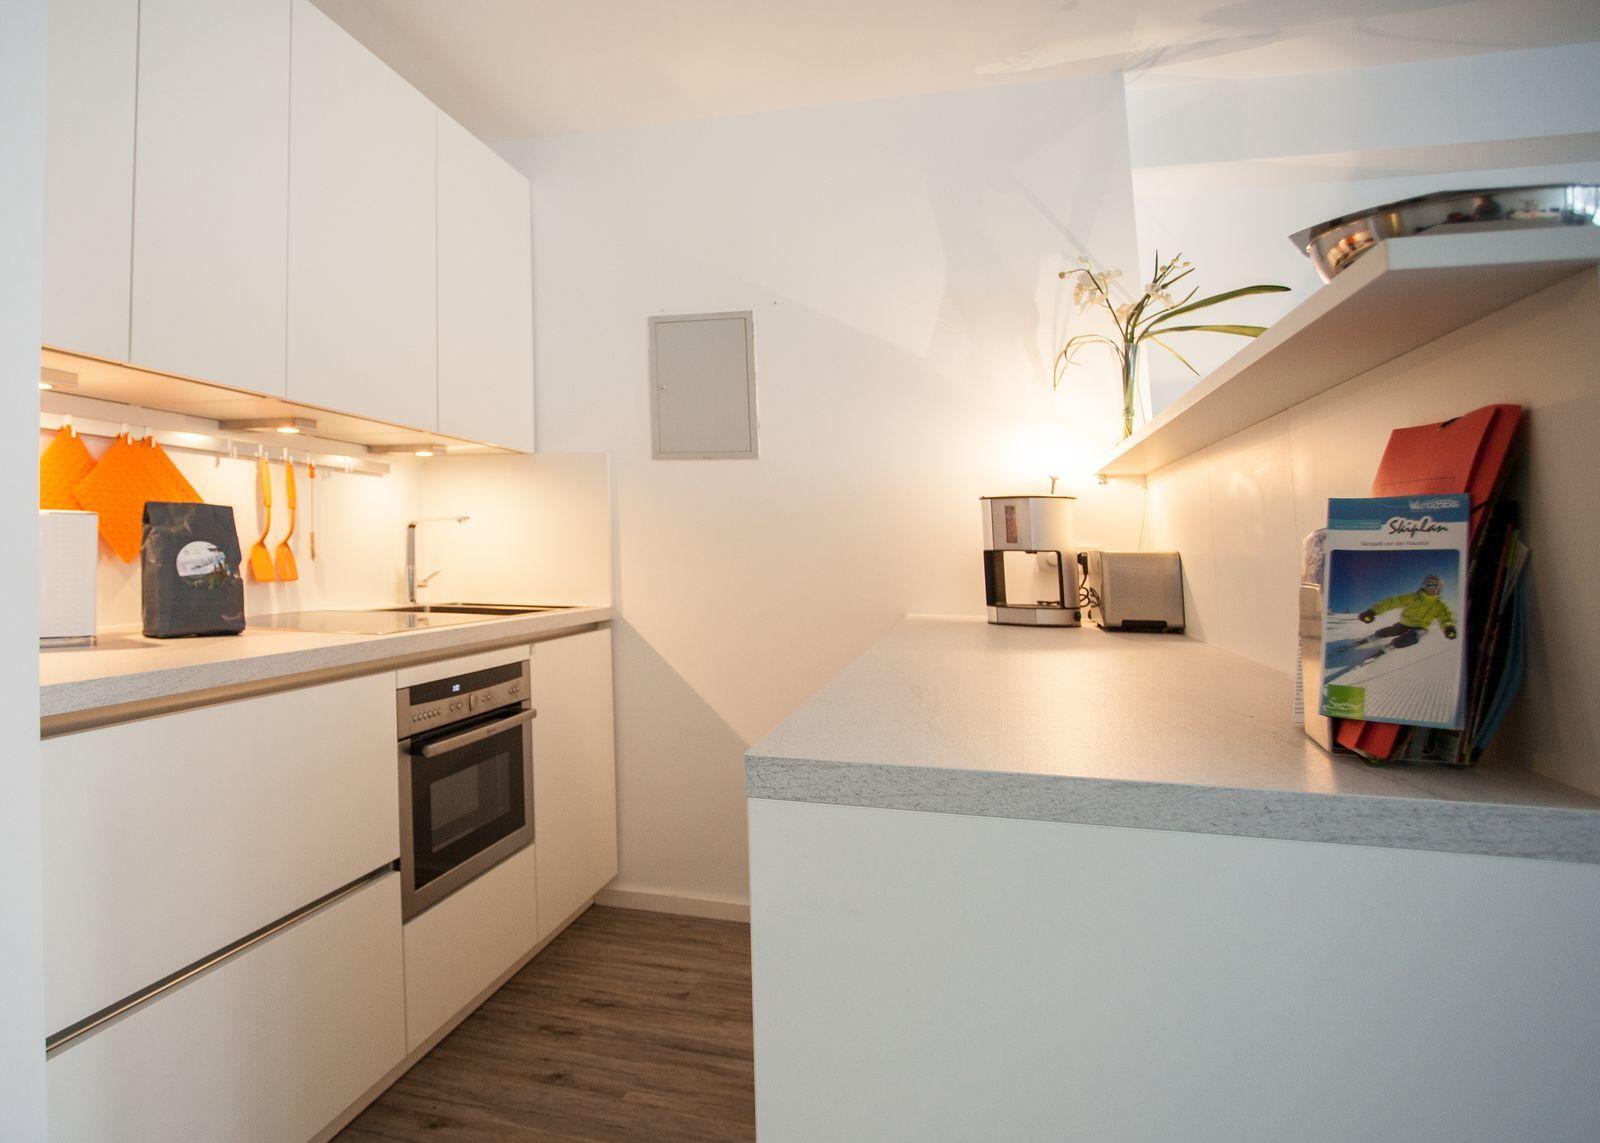 Apartment - Am Waltenberg 70-KO